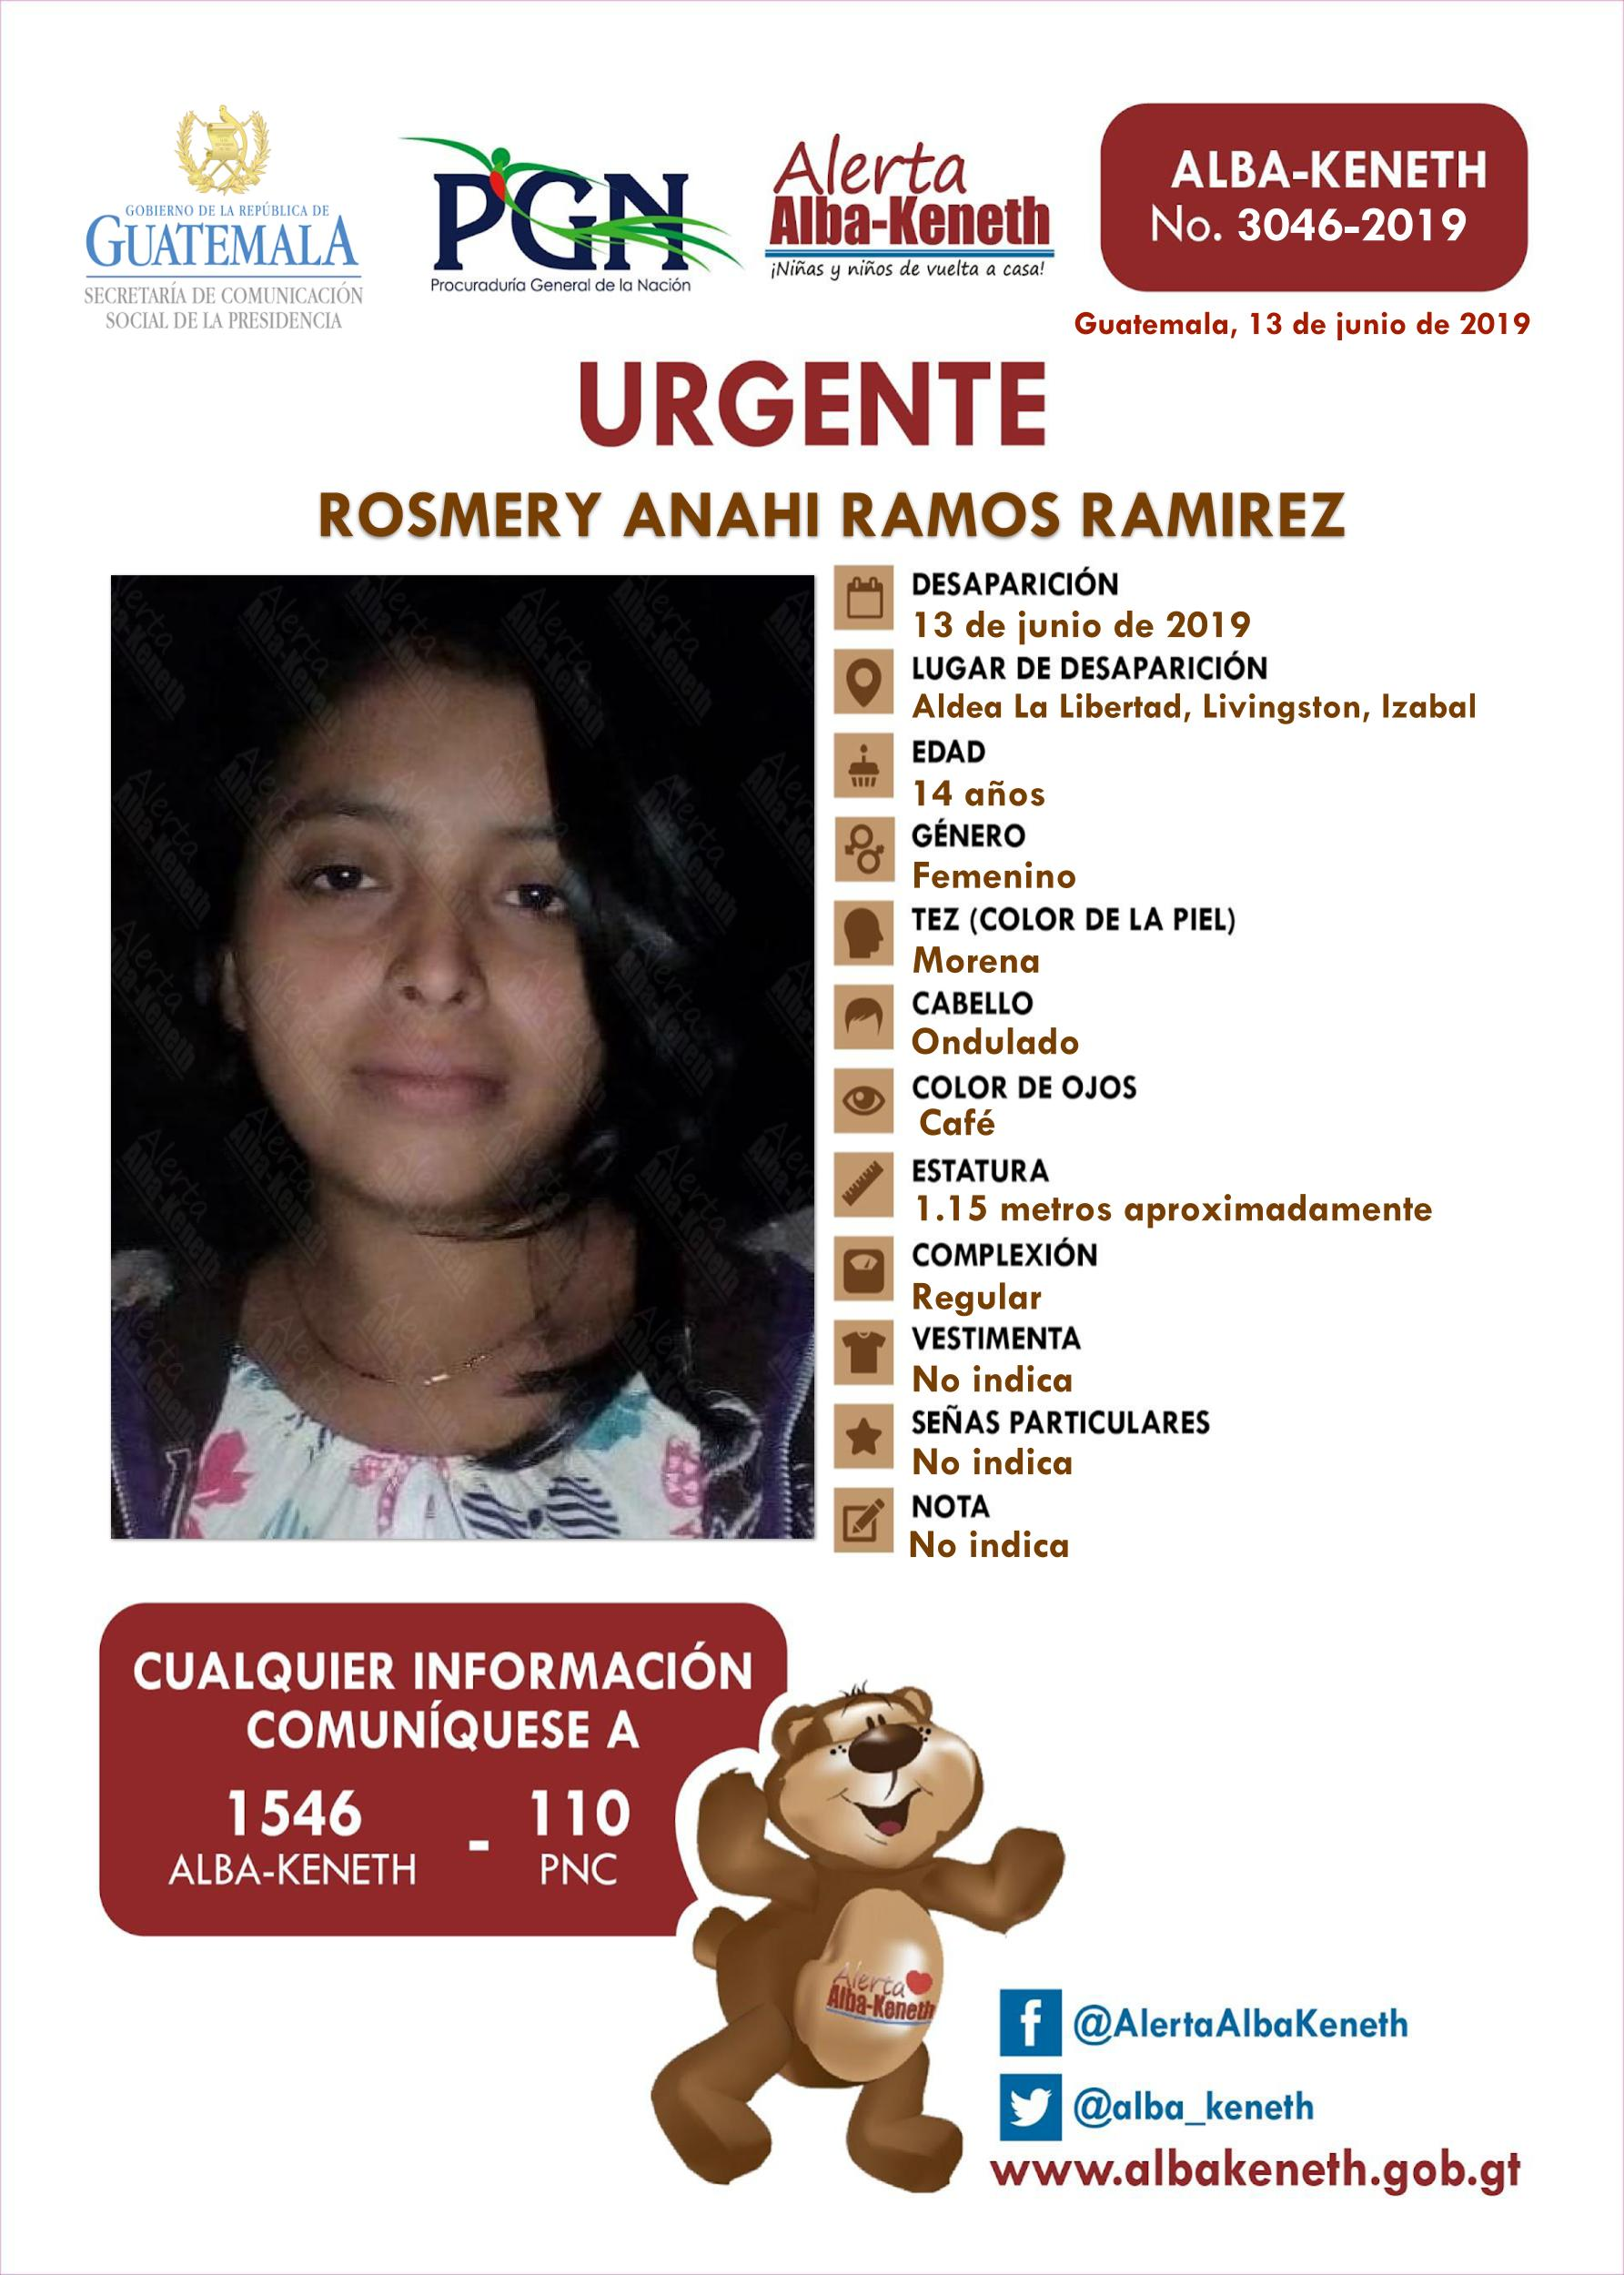 Rosmery Anahi Ramos Ramirez